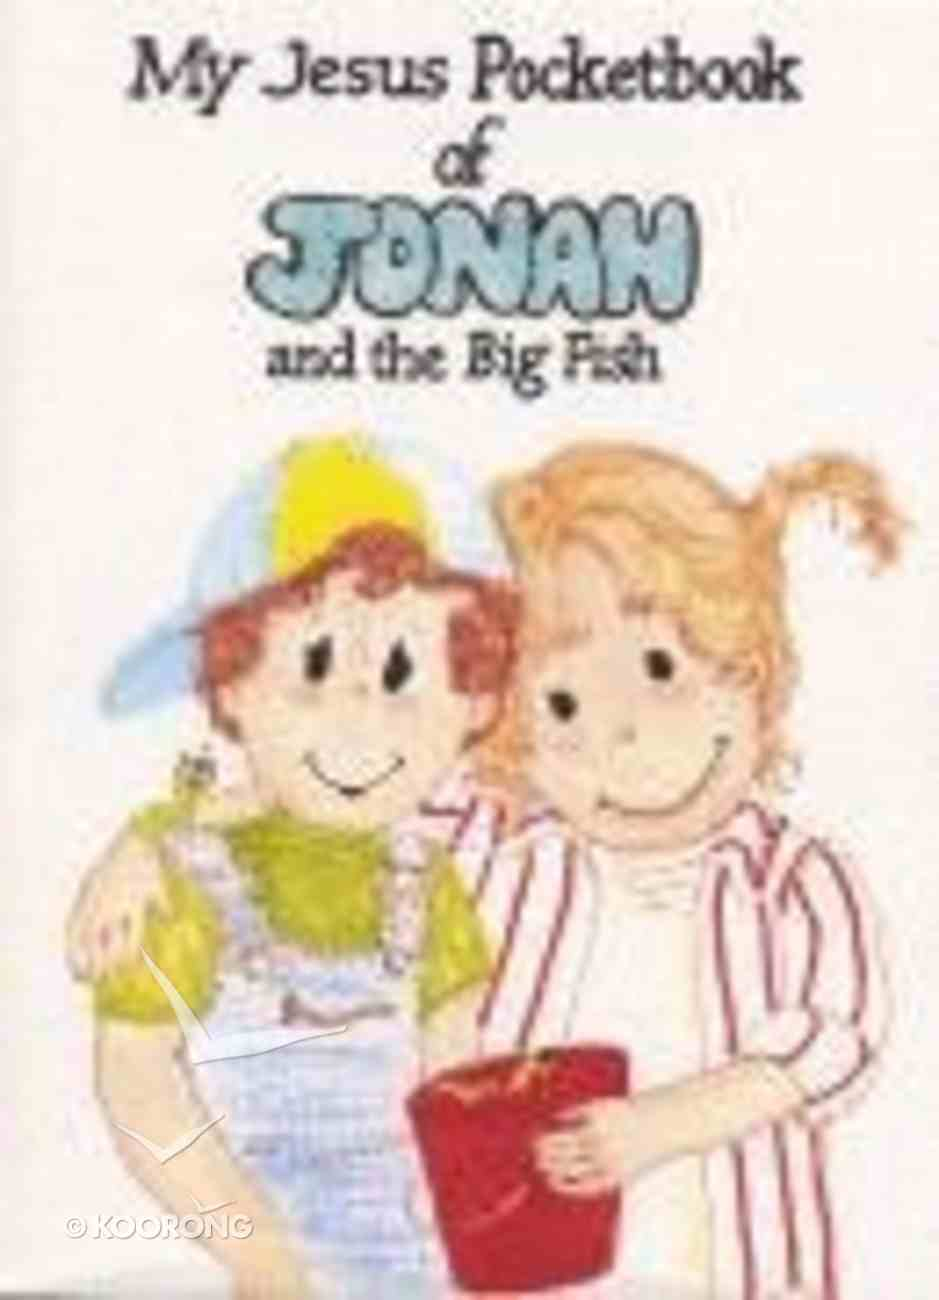 My Jesus Pocketbook of Jonah and the Big Fish (My Jesus Pocketbook Series) Paperback